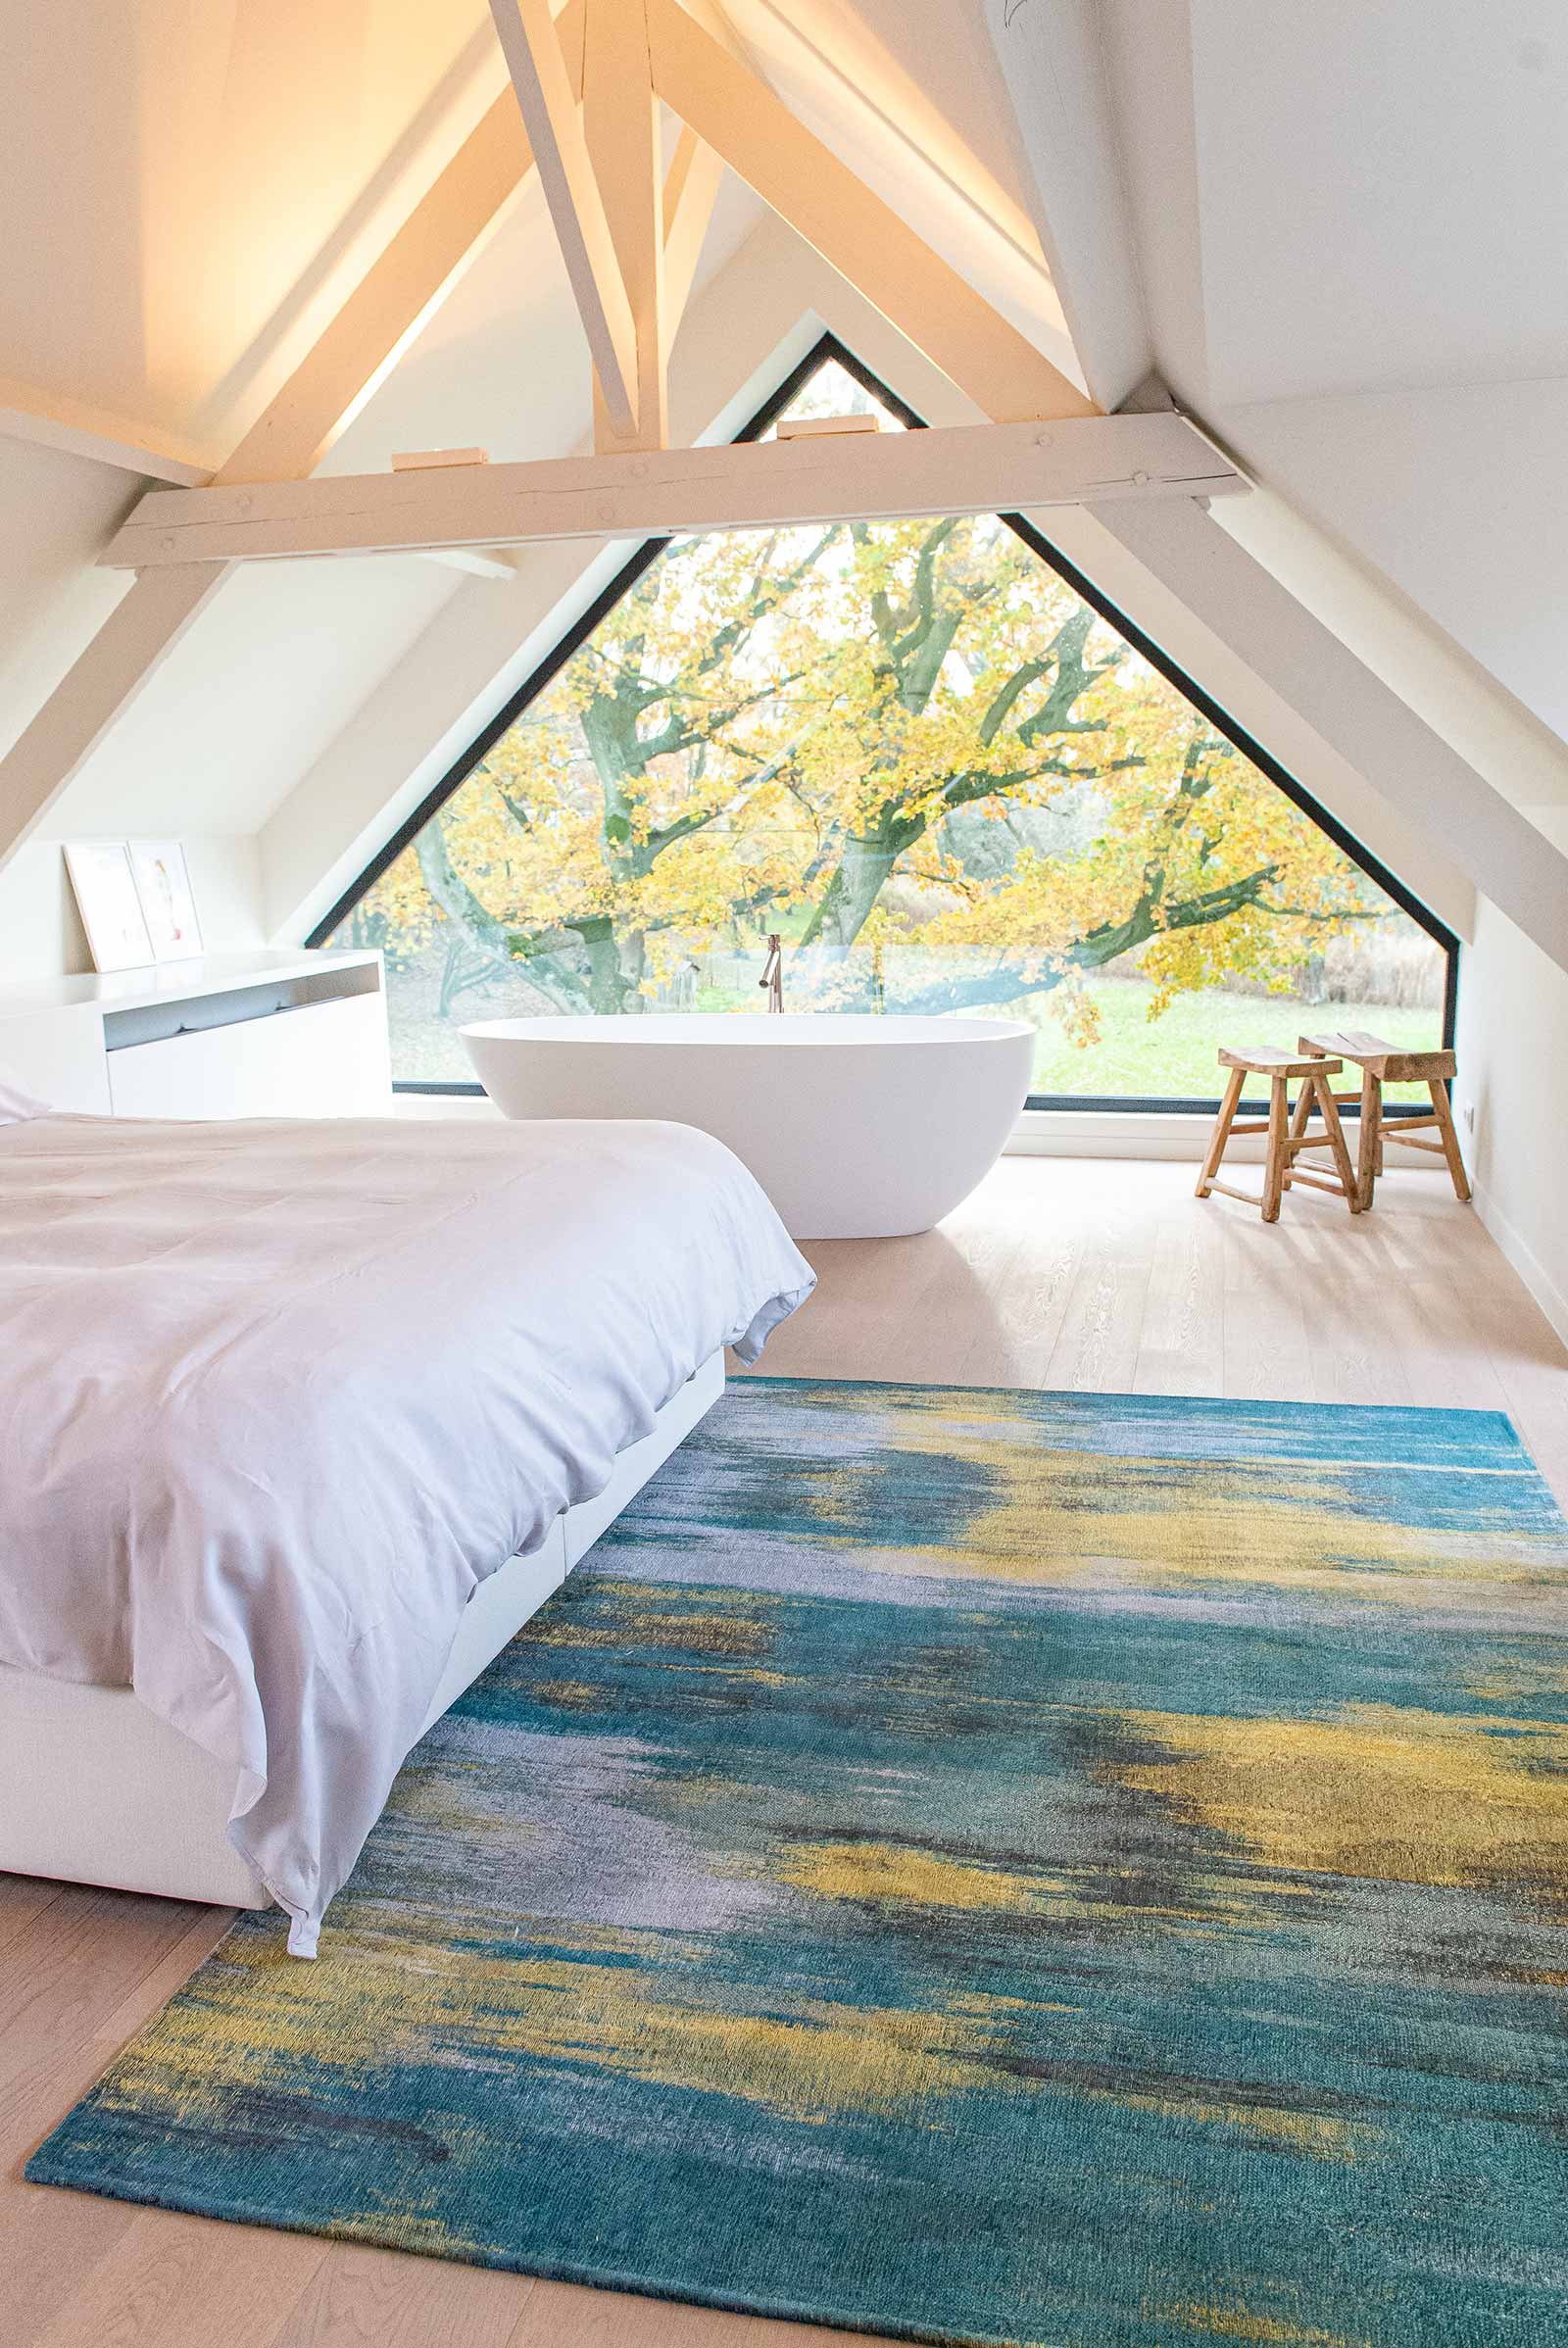 Louis De Poortere alfombra LX 9119 Atlantic Monetti Nymphea Blue interior 2